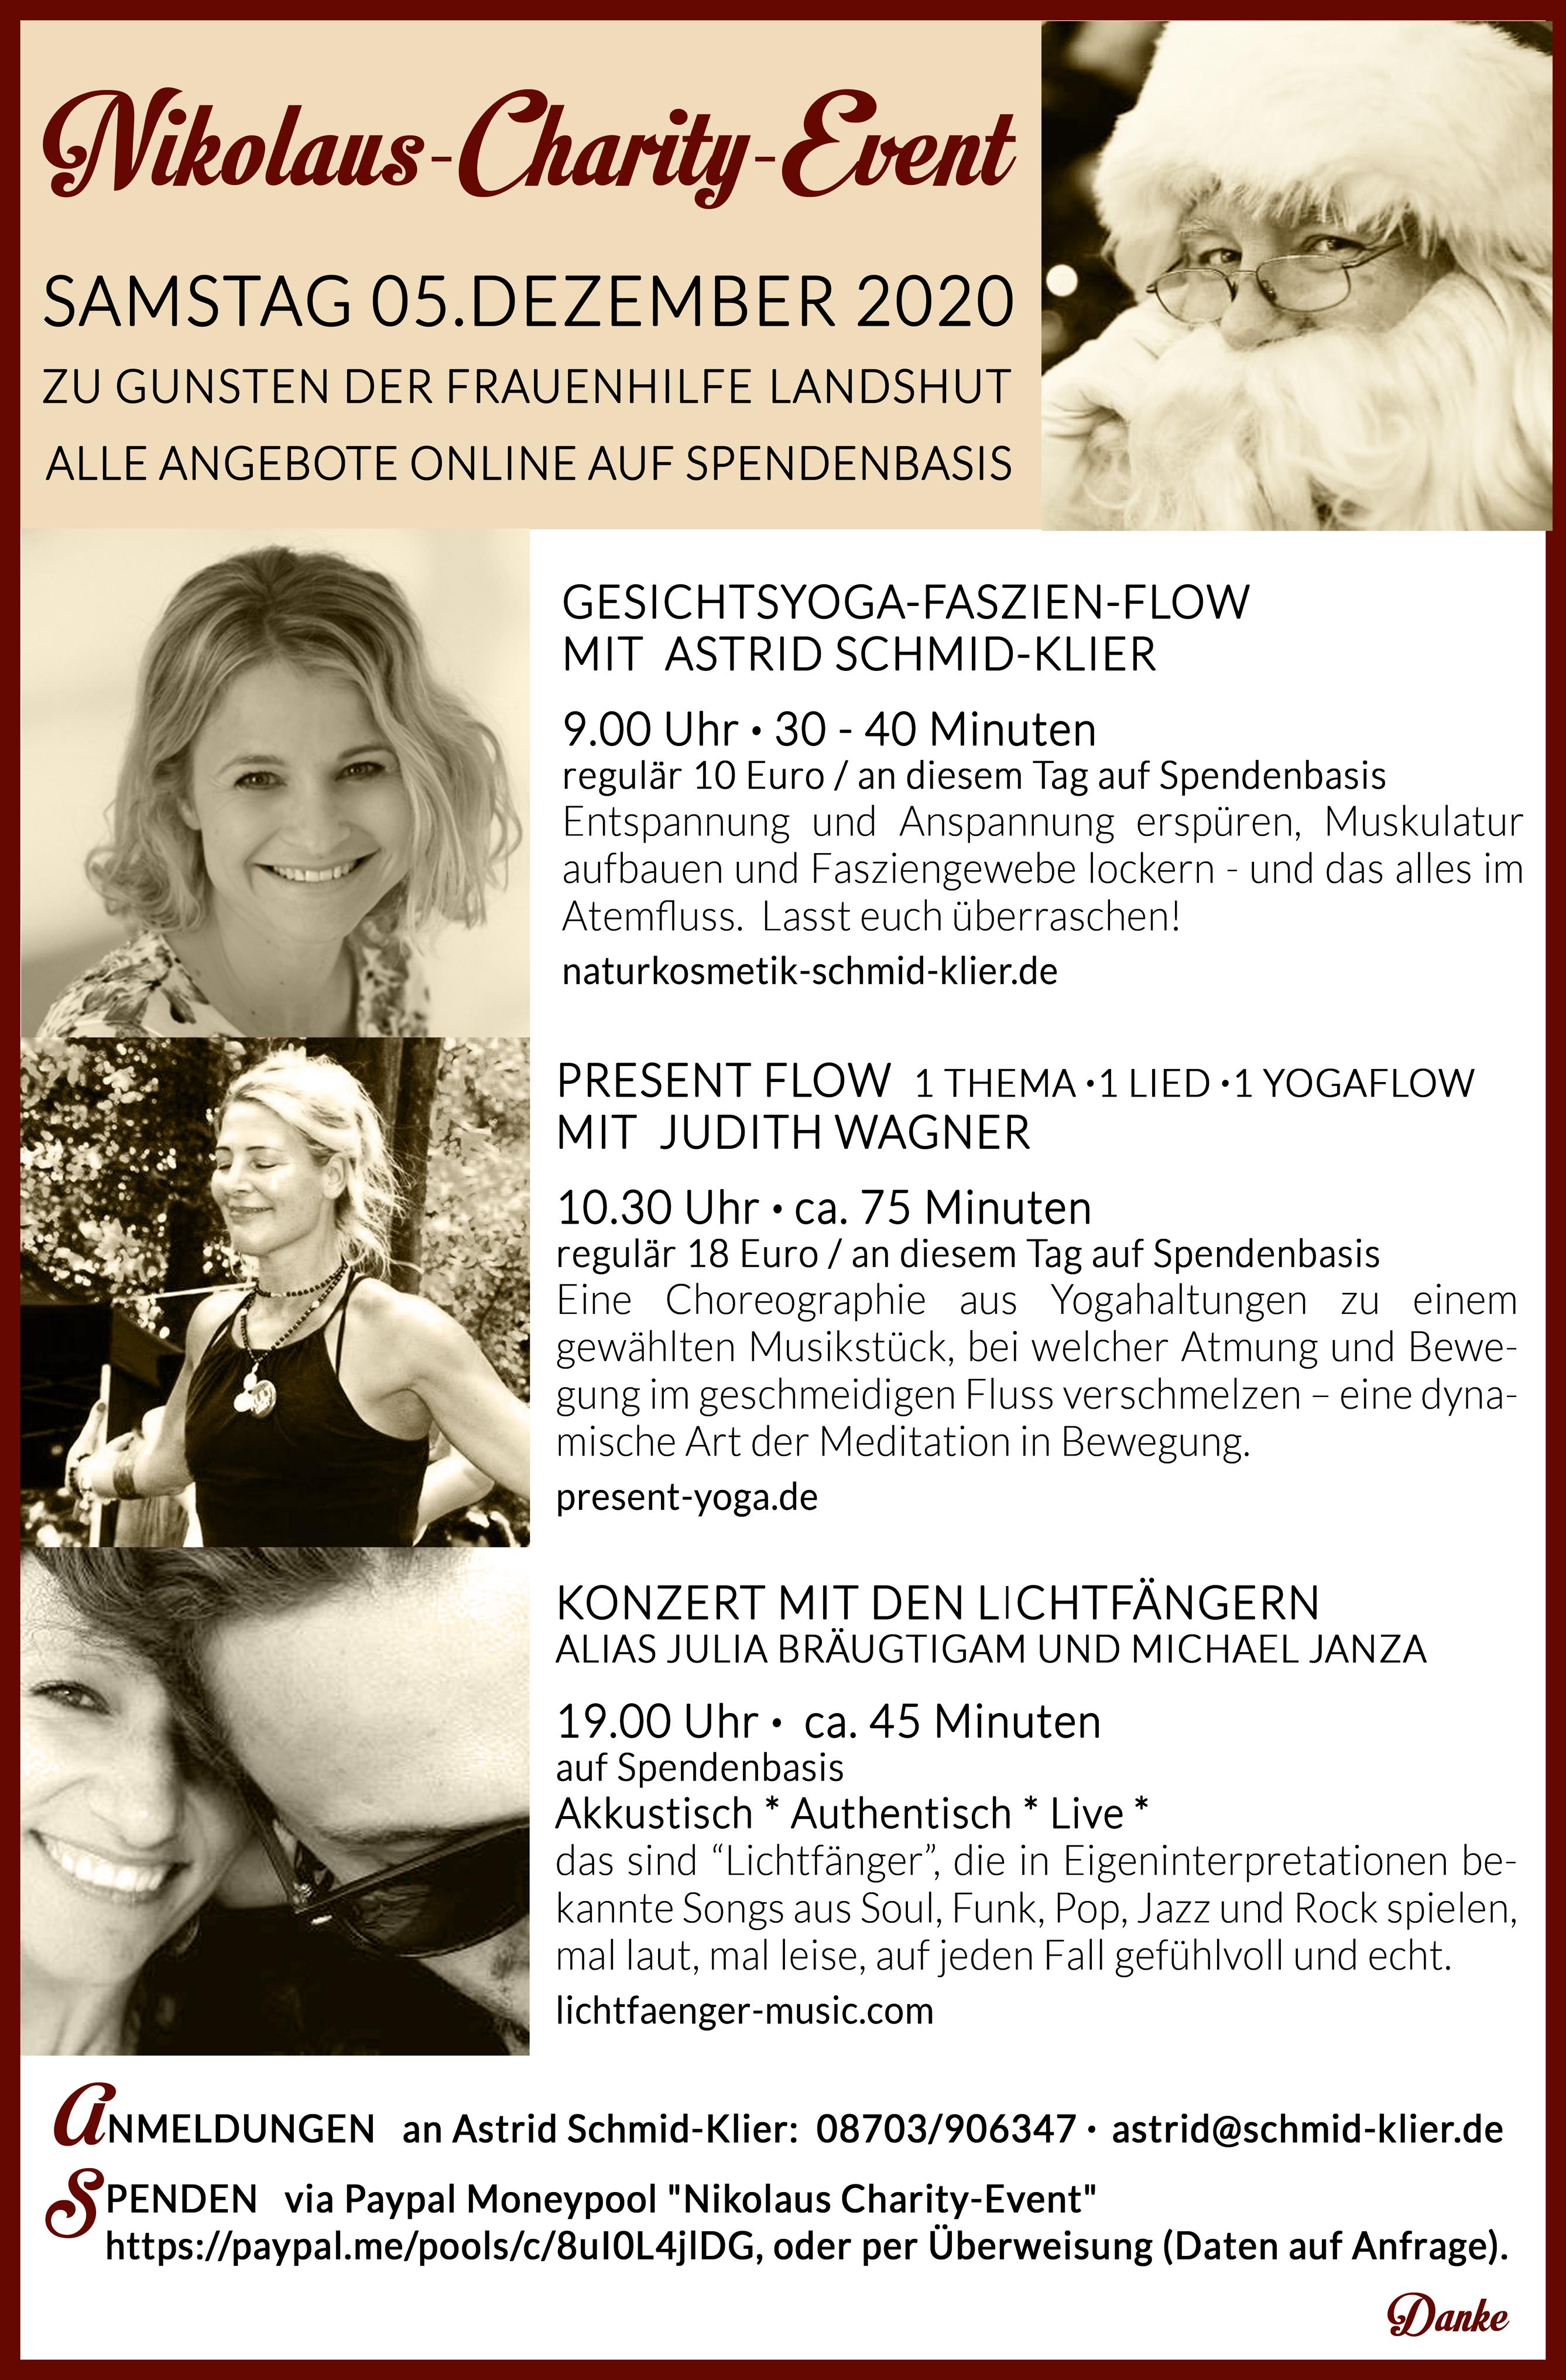 Nikolaus Charity-Event 2020